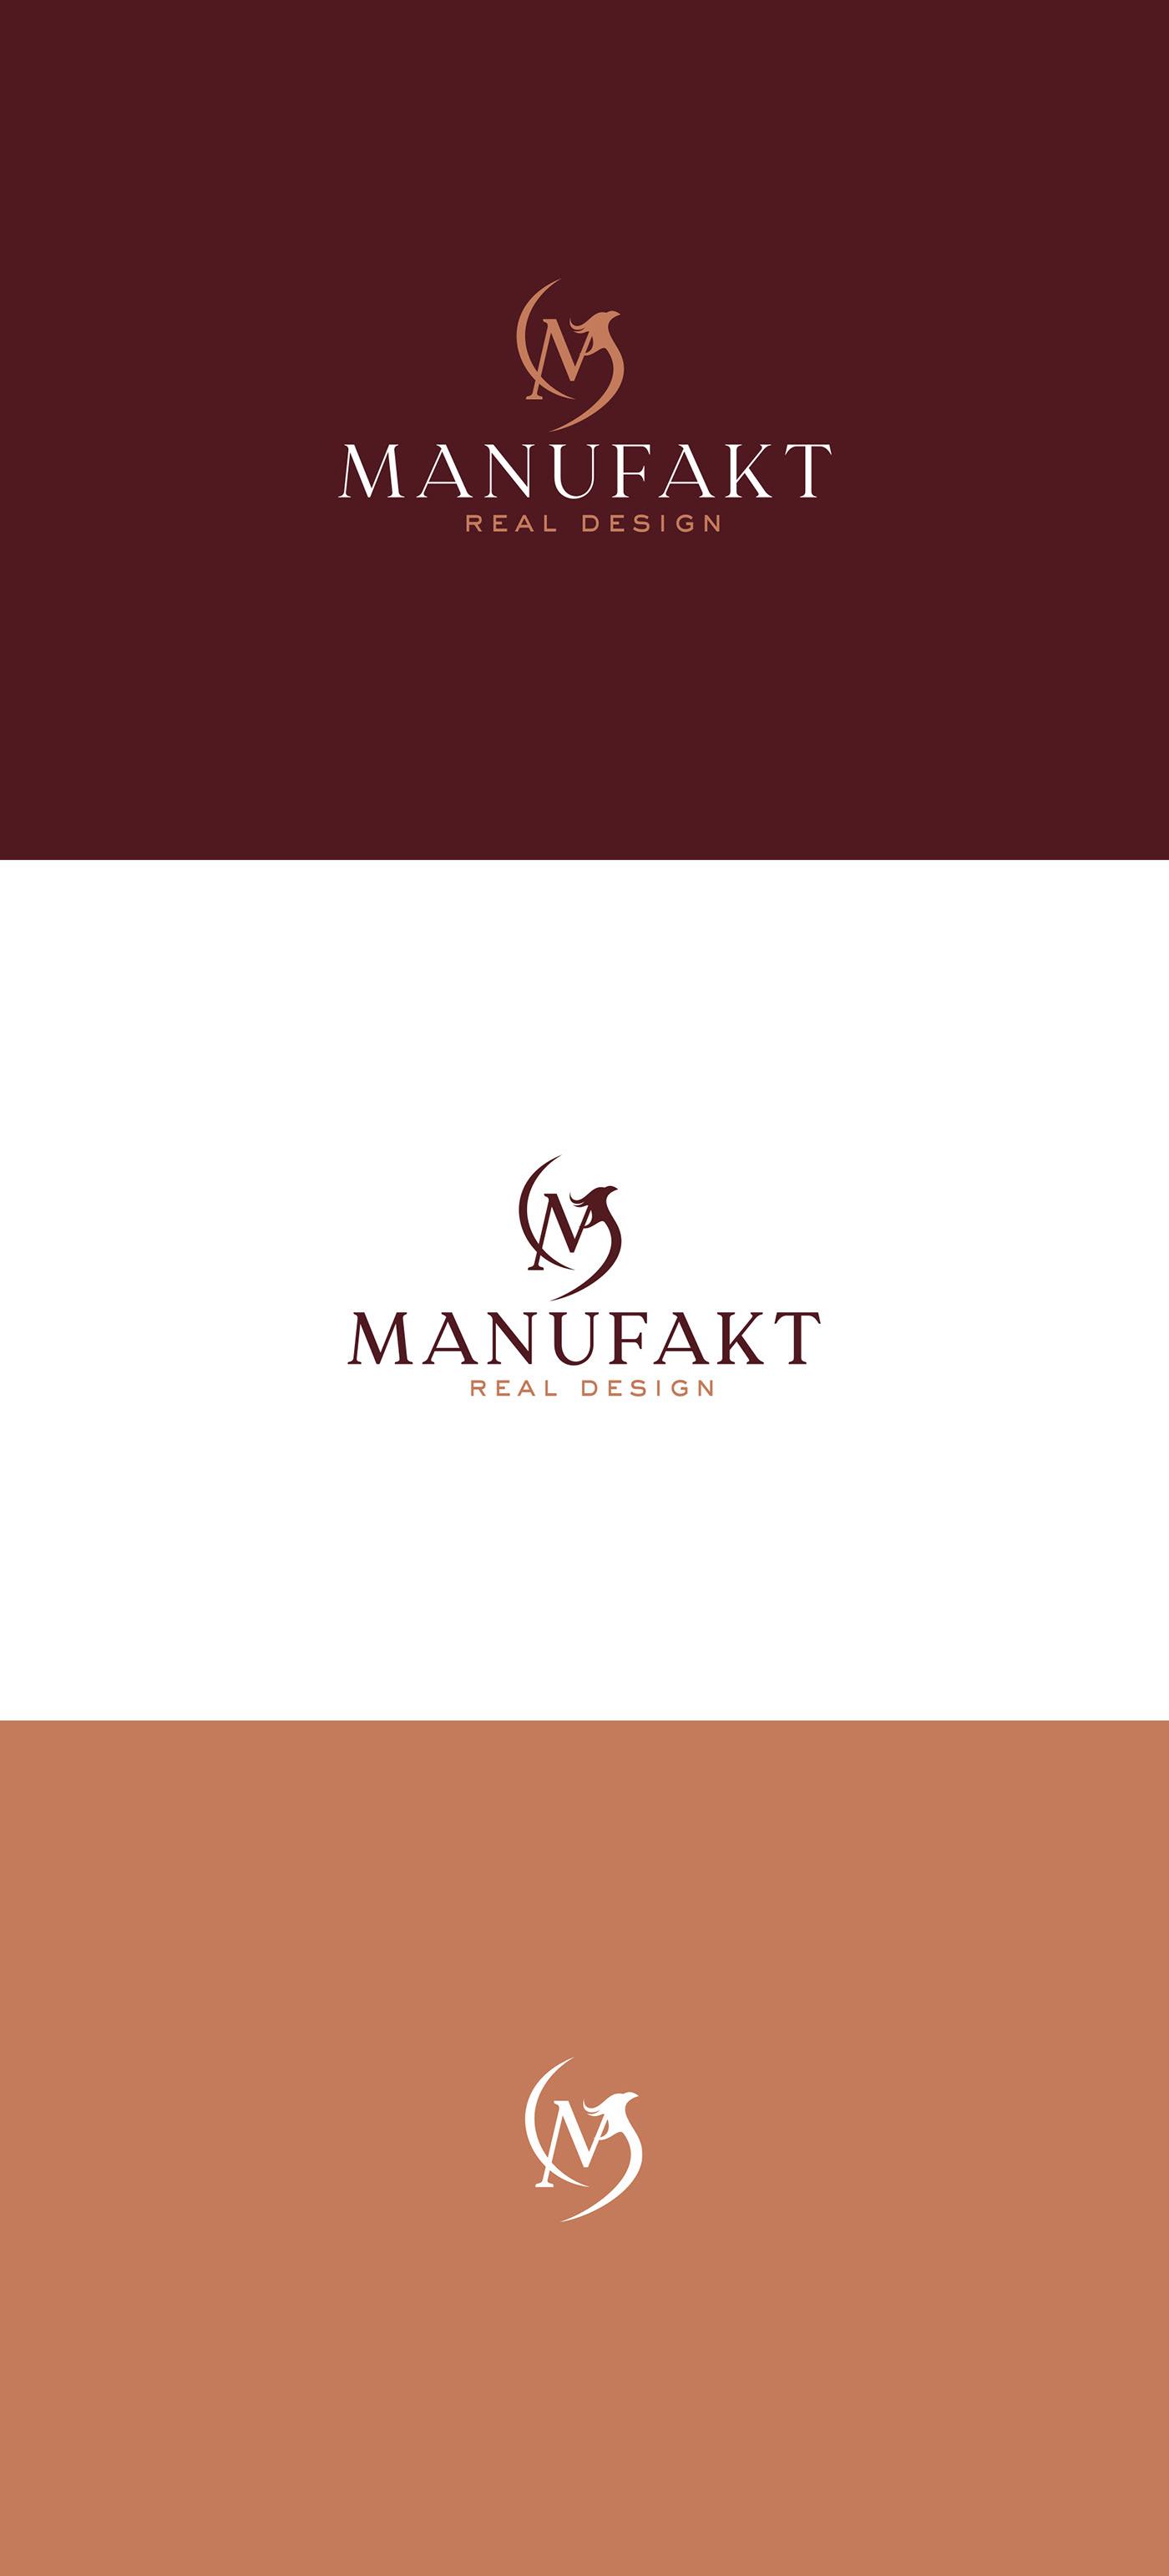 #brand #corporatedesign #Logo